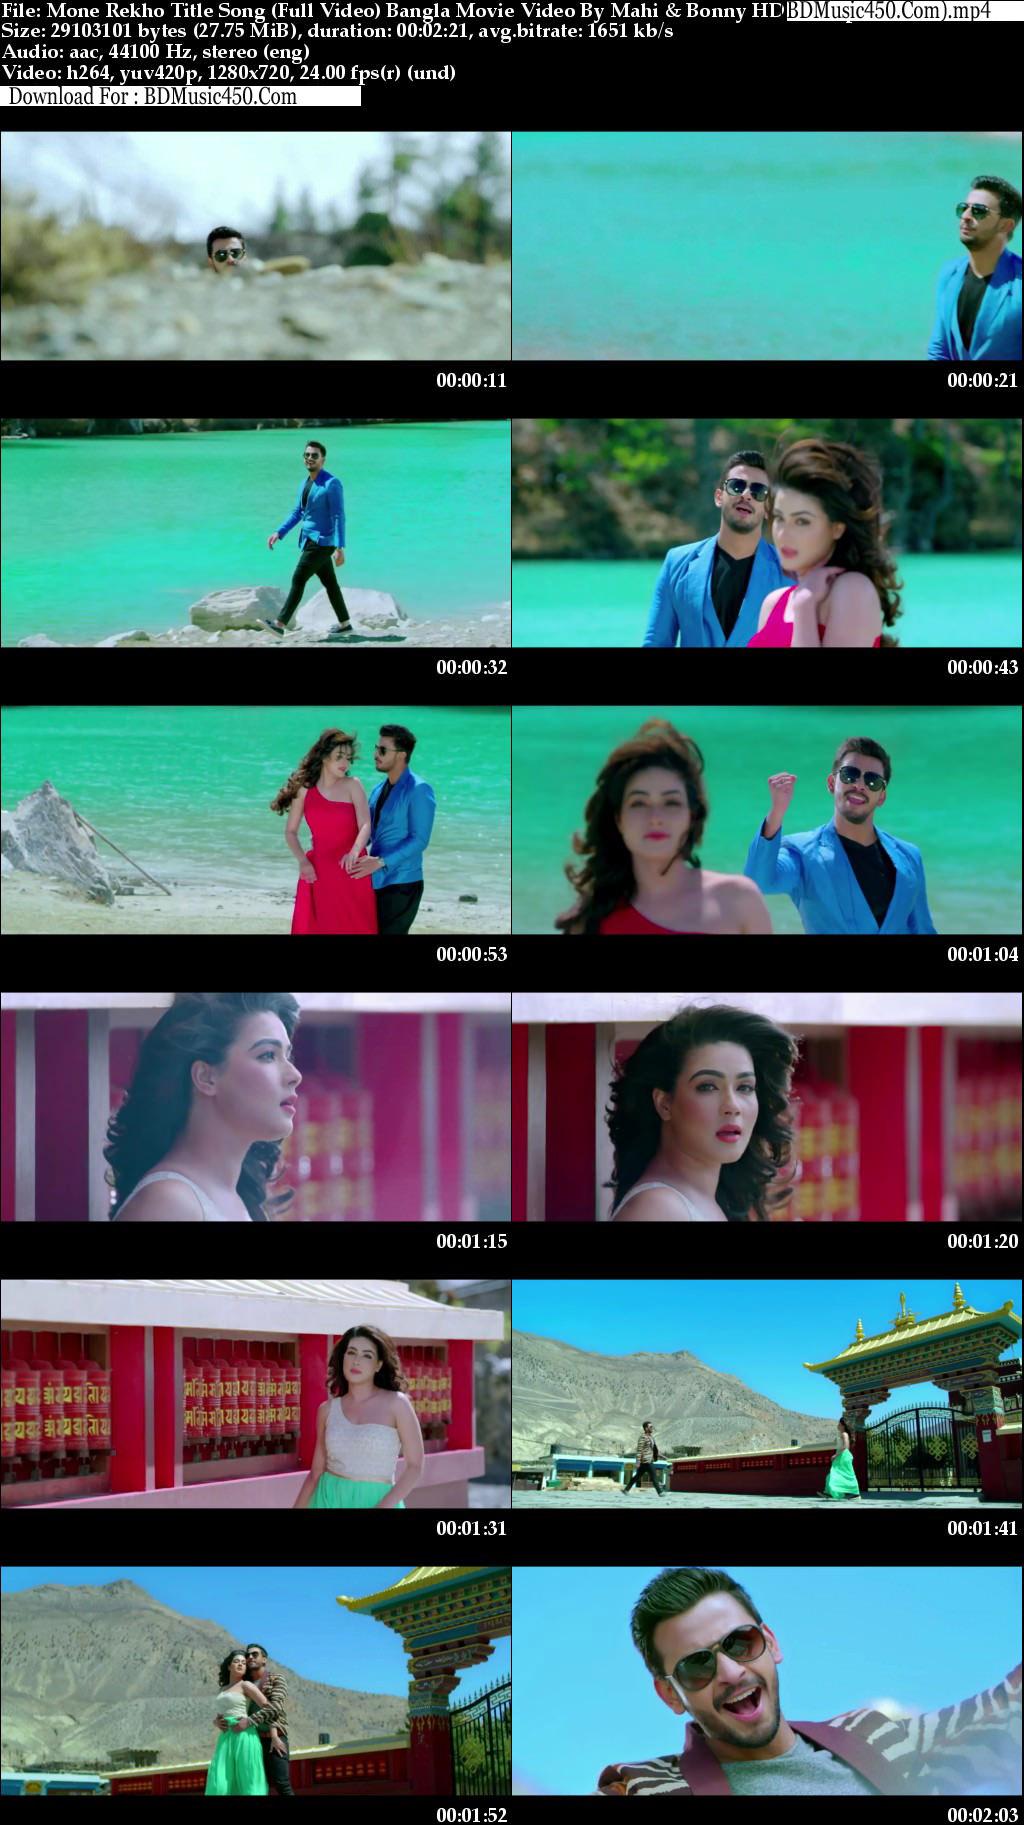 Mone Rekho 2018 New Bangla Movie Video By Mahi & Bonny HD